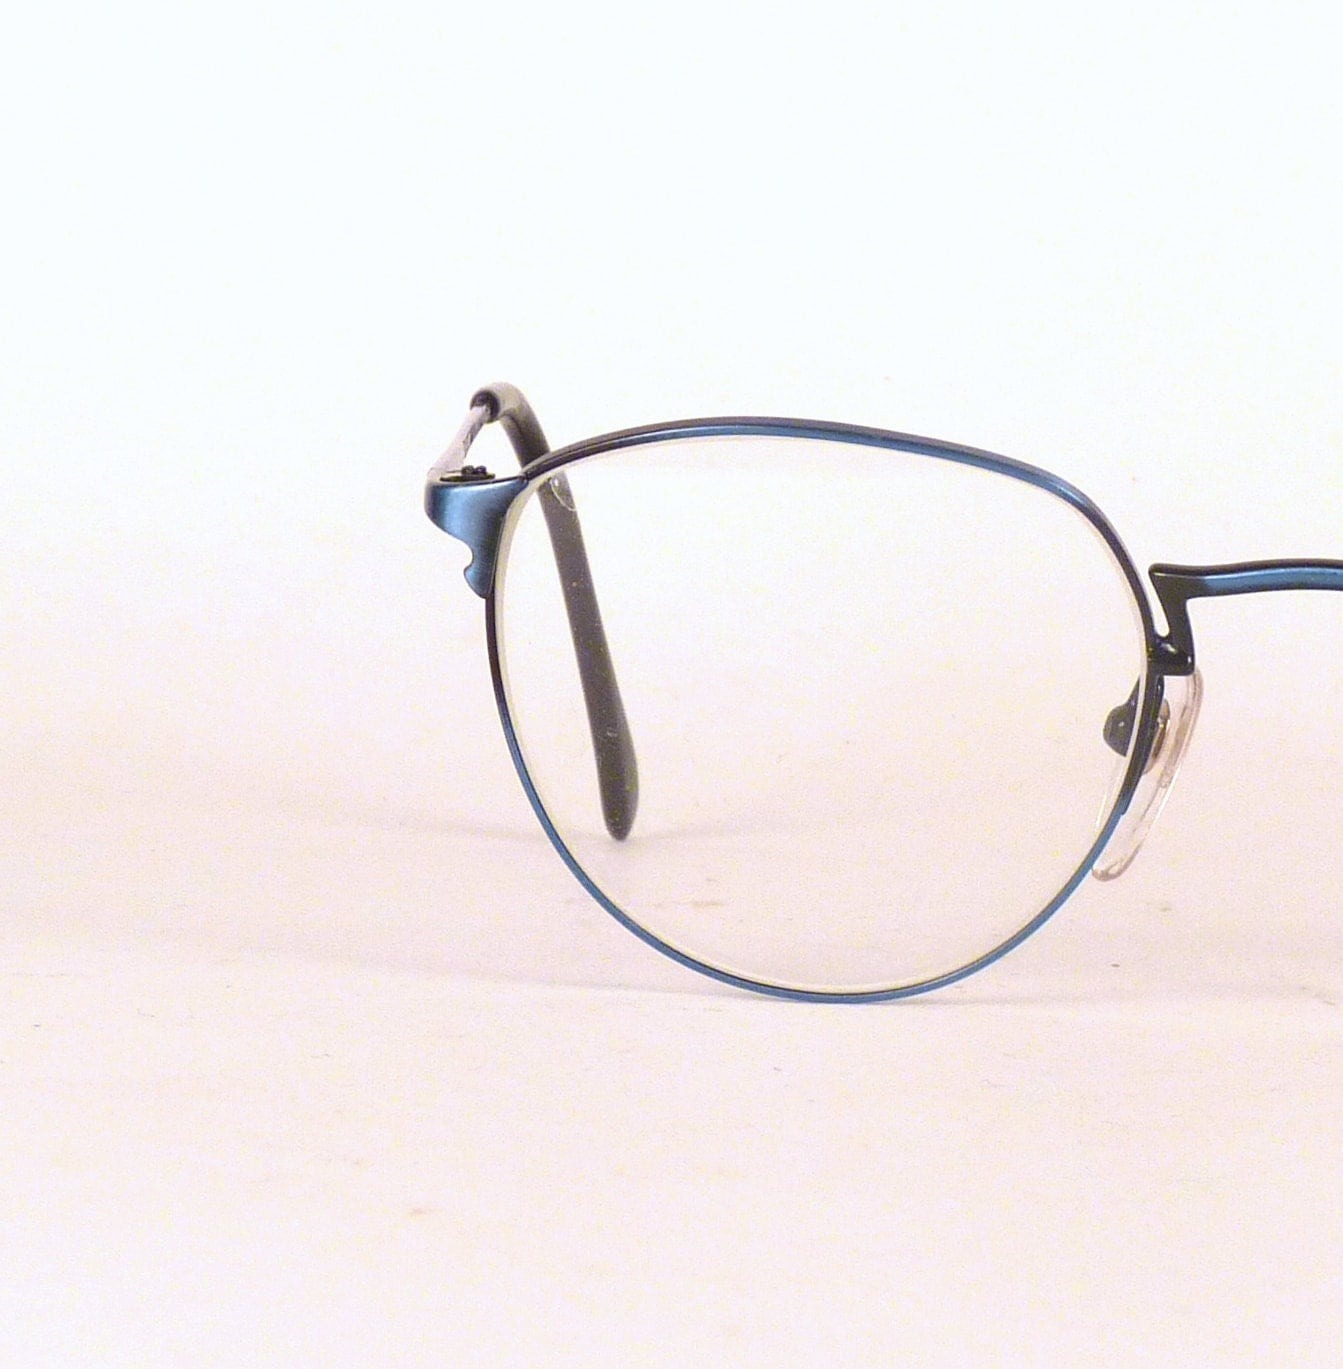 Aqua Blue Glasses Frames : Vintage Eyeglasses / Turquoise Eye wear / Unisex eyeglasses